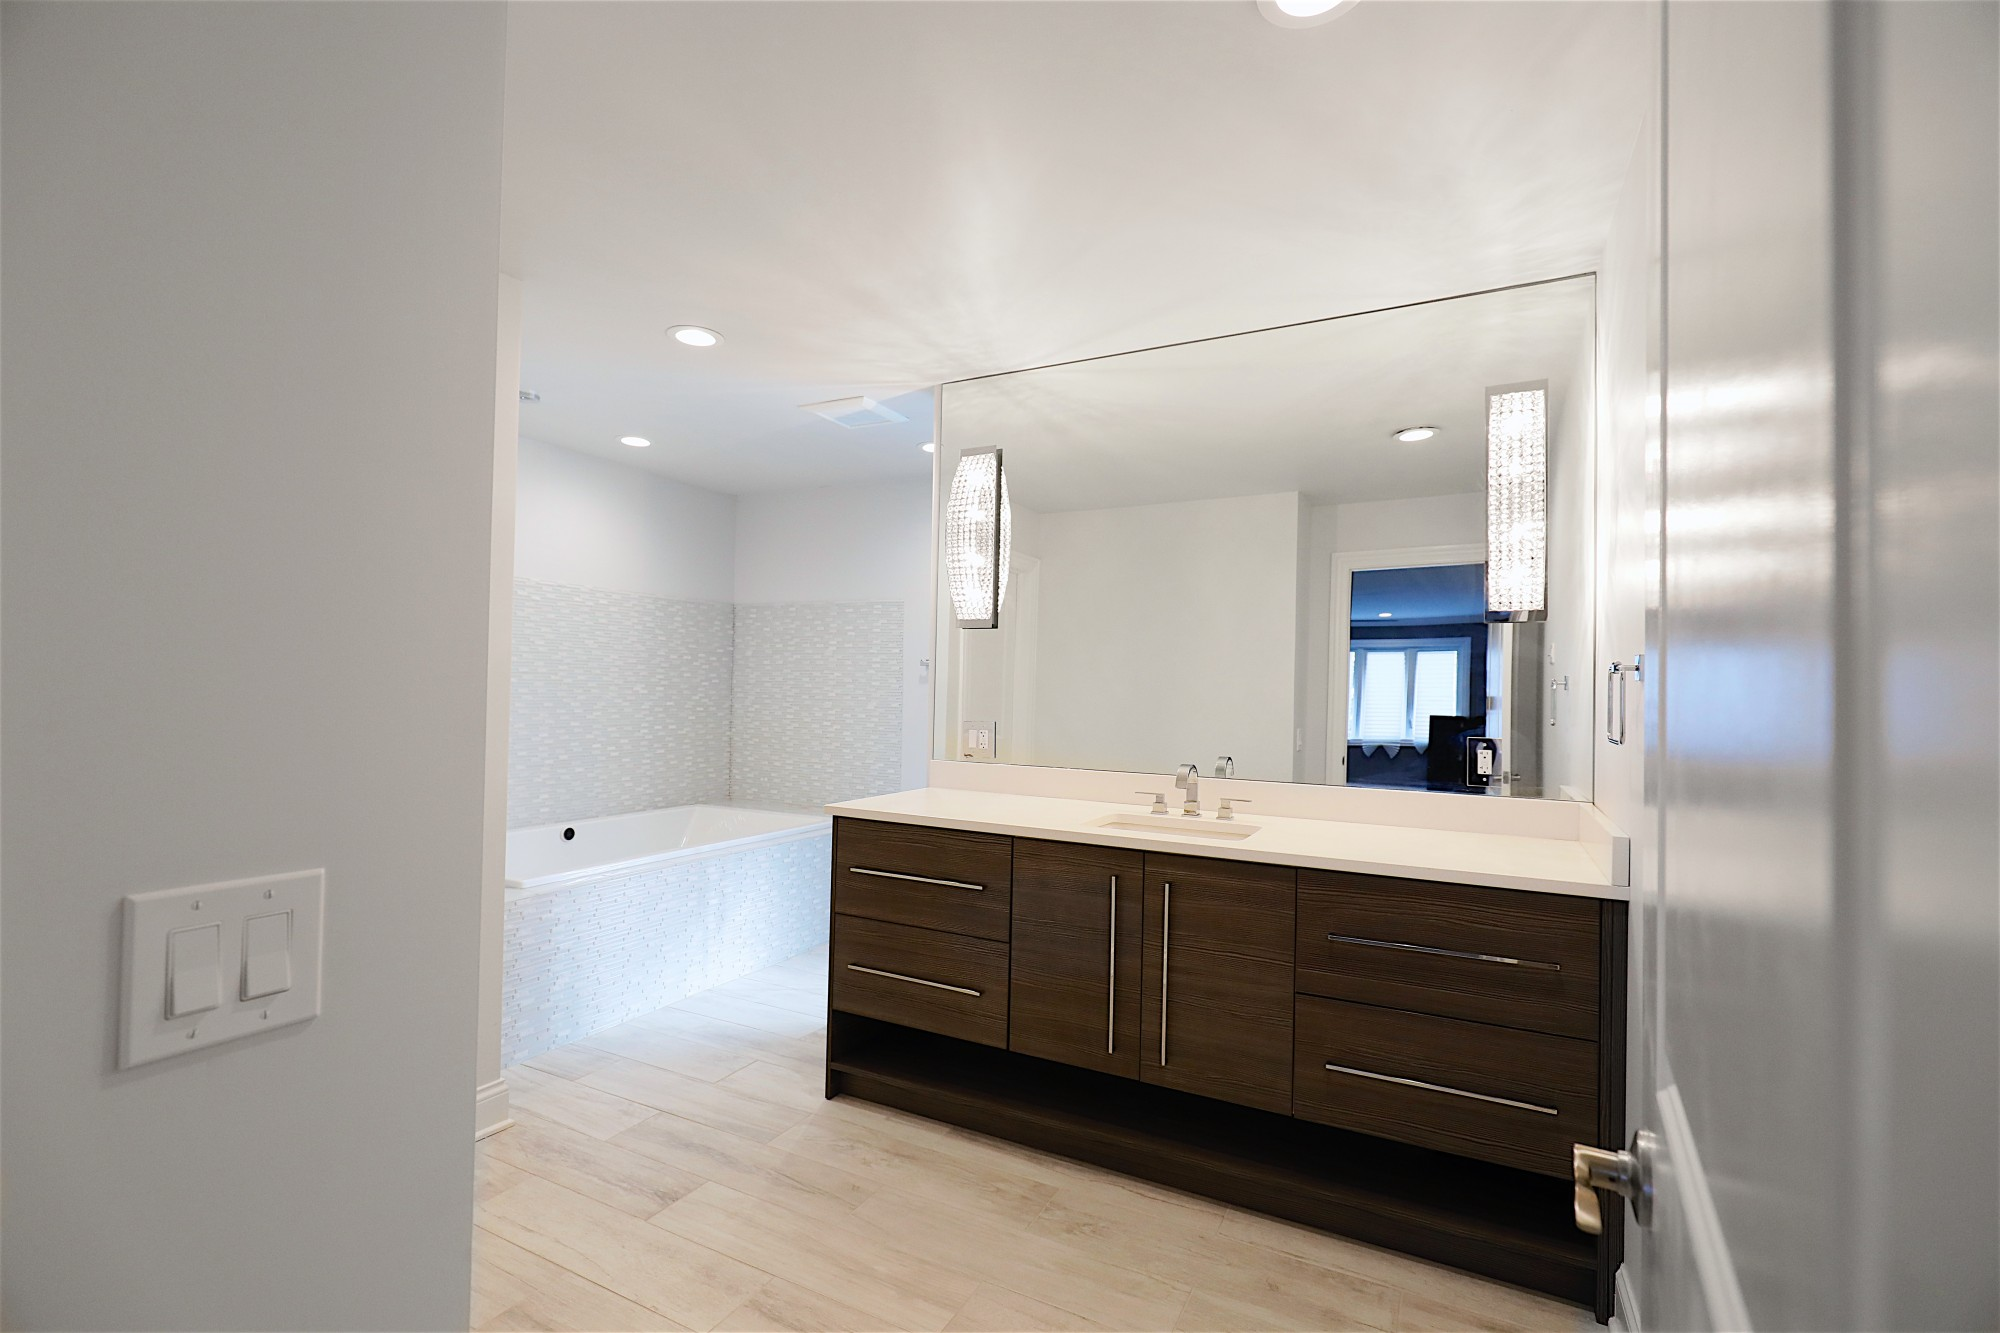 Lava Cabinets Kitchen Bath Kitchen Cabinets